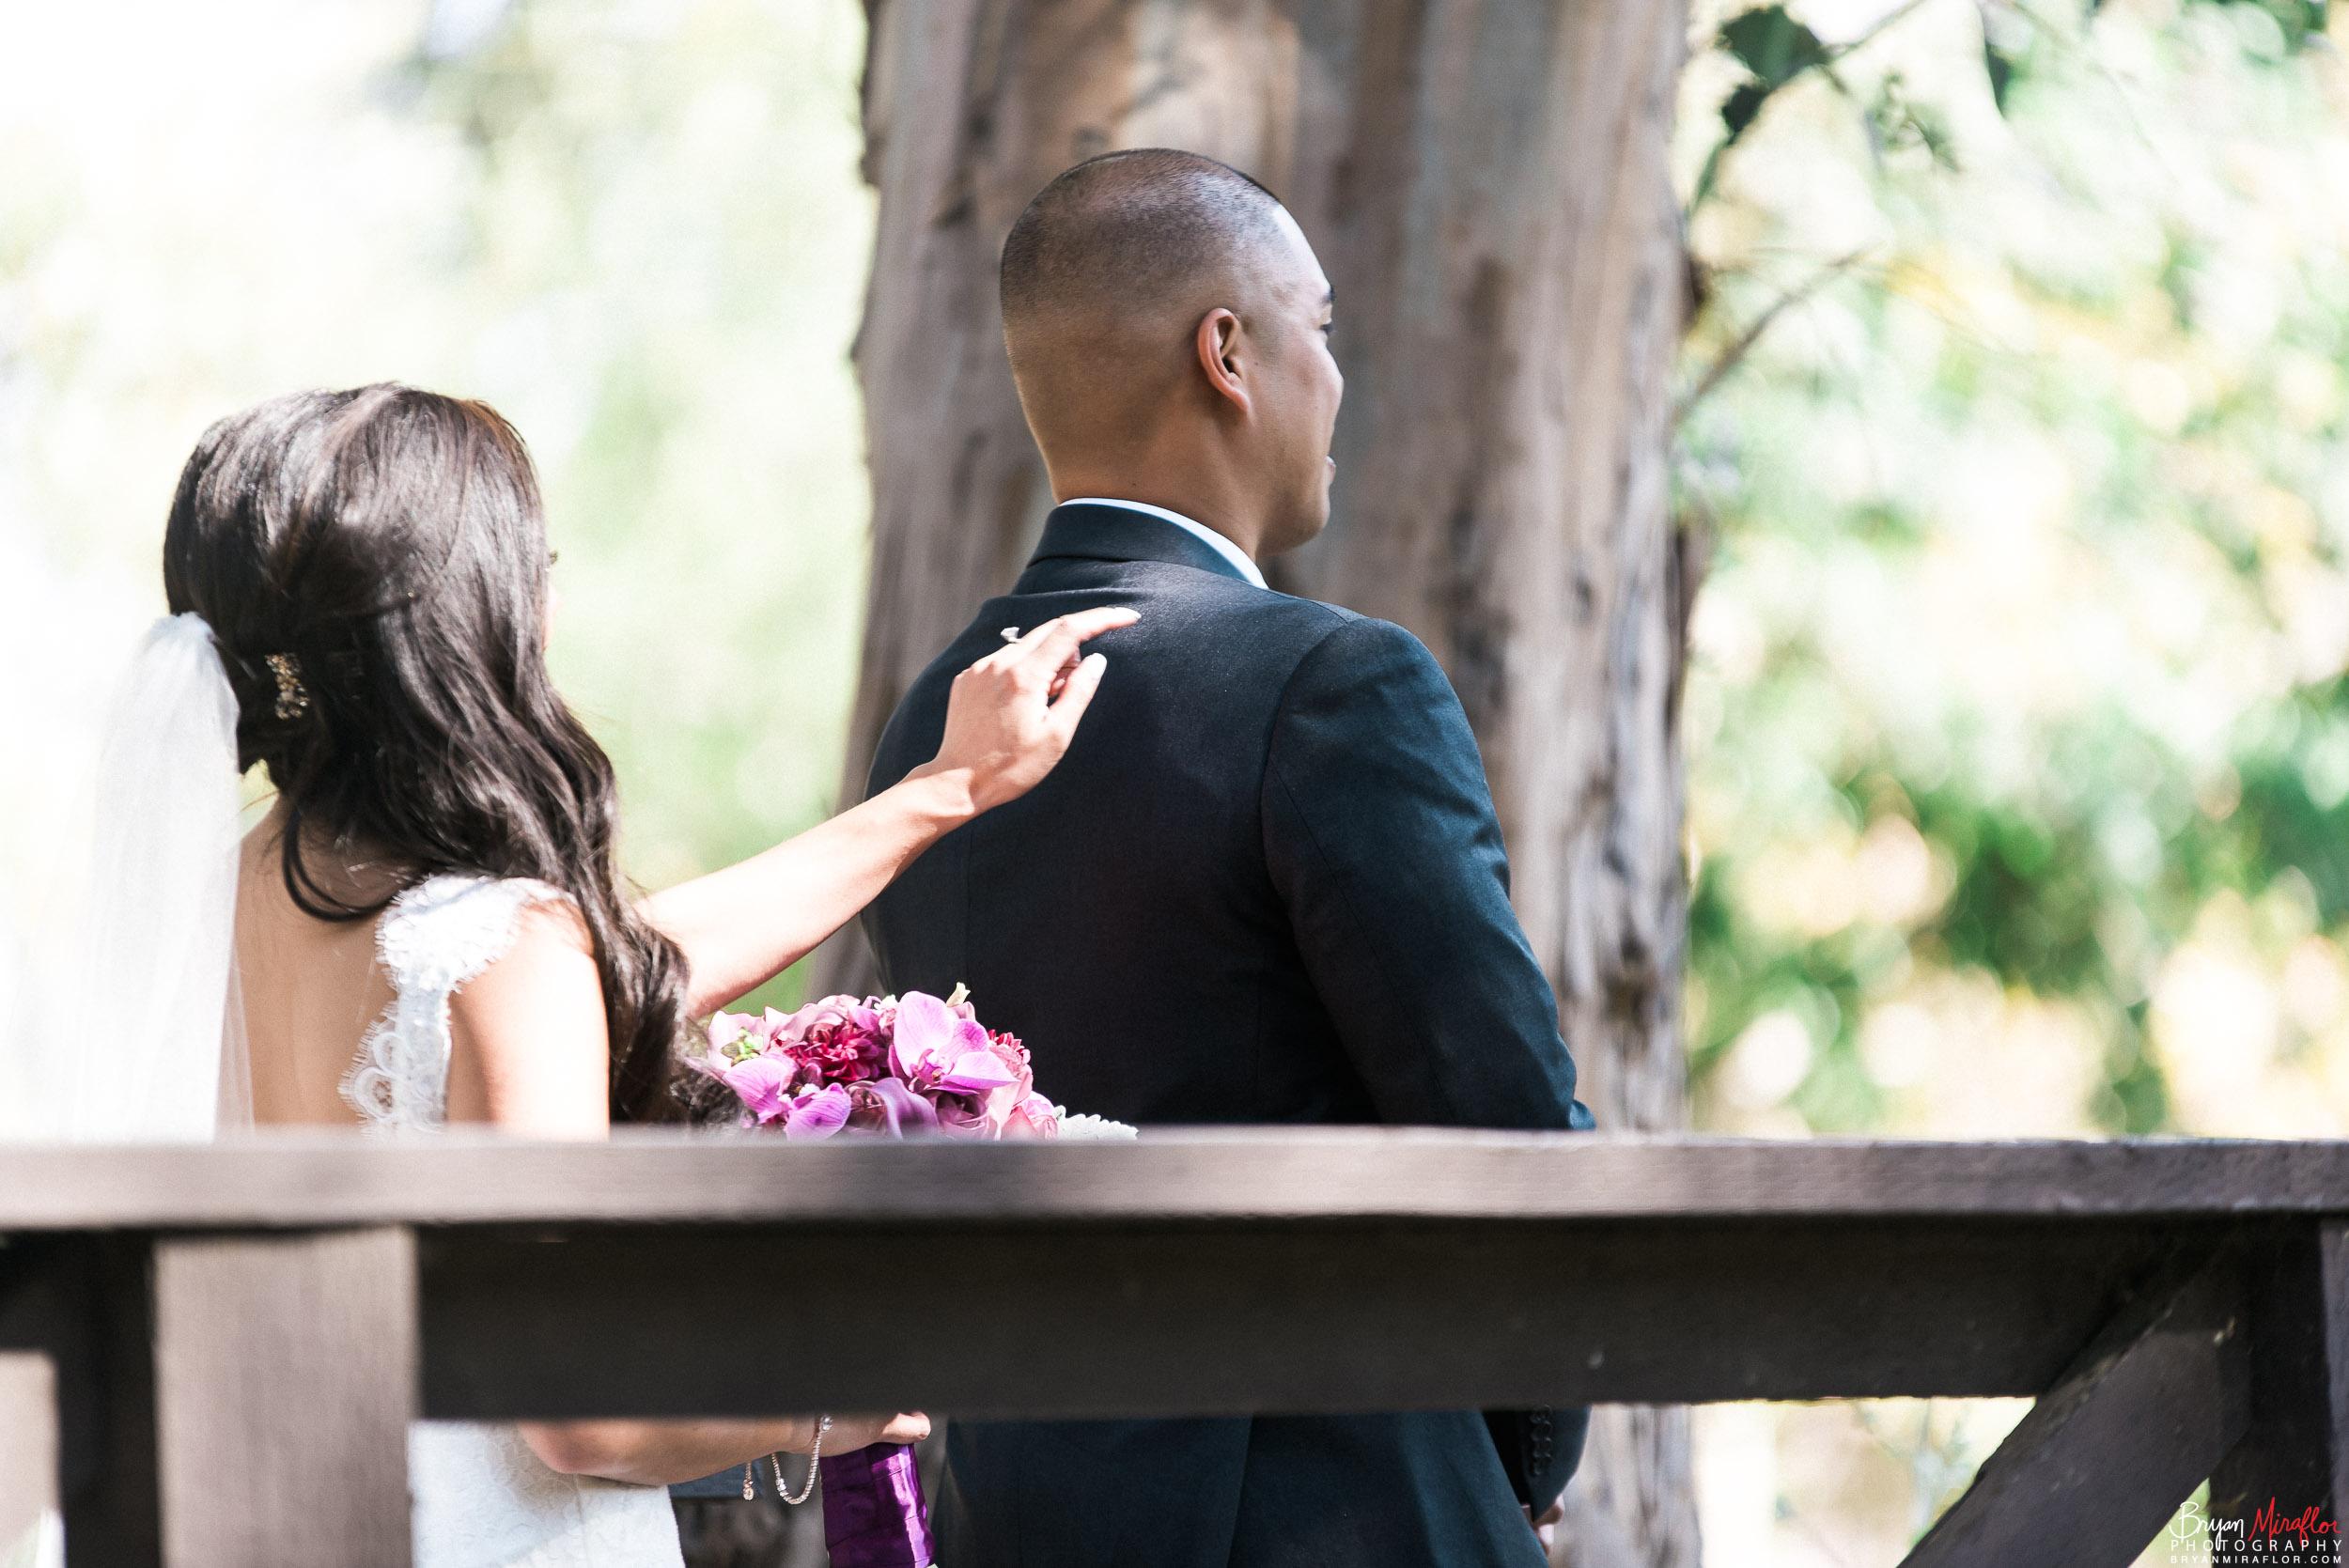 Bryan-Miraflor-Photography-Trisha-Dexter-Married-20170923-018.jpg